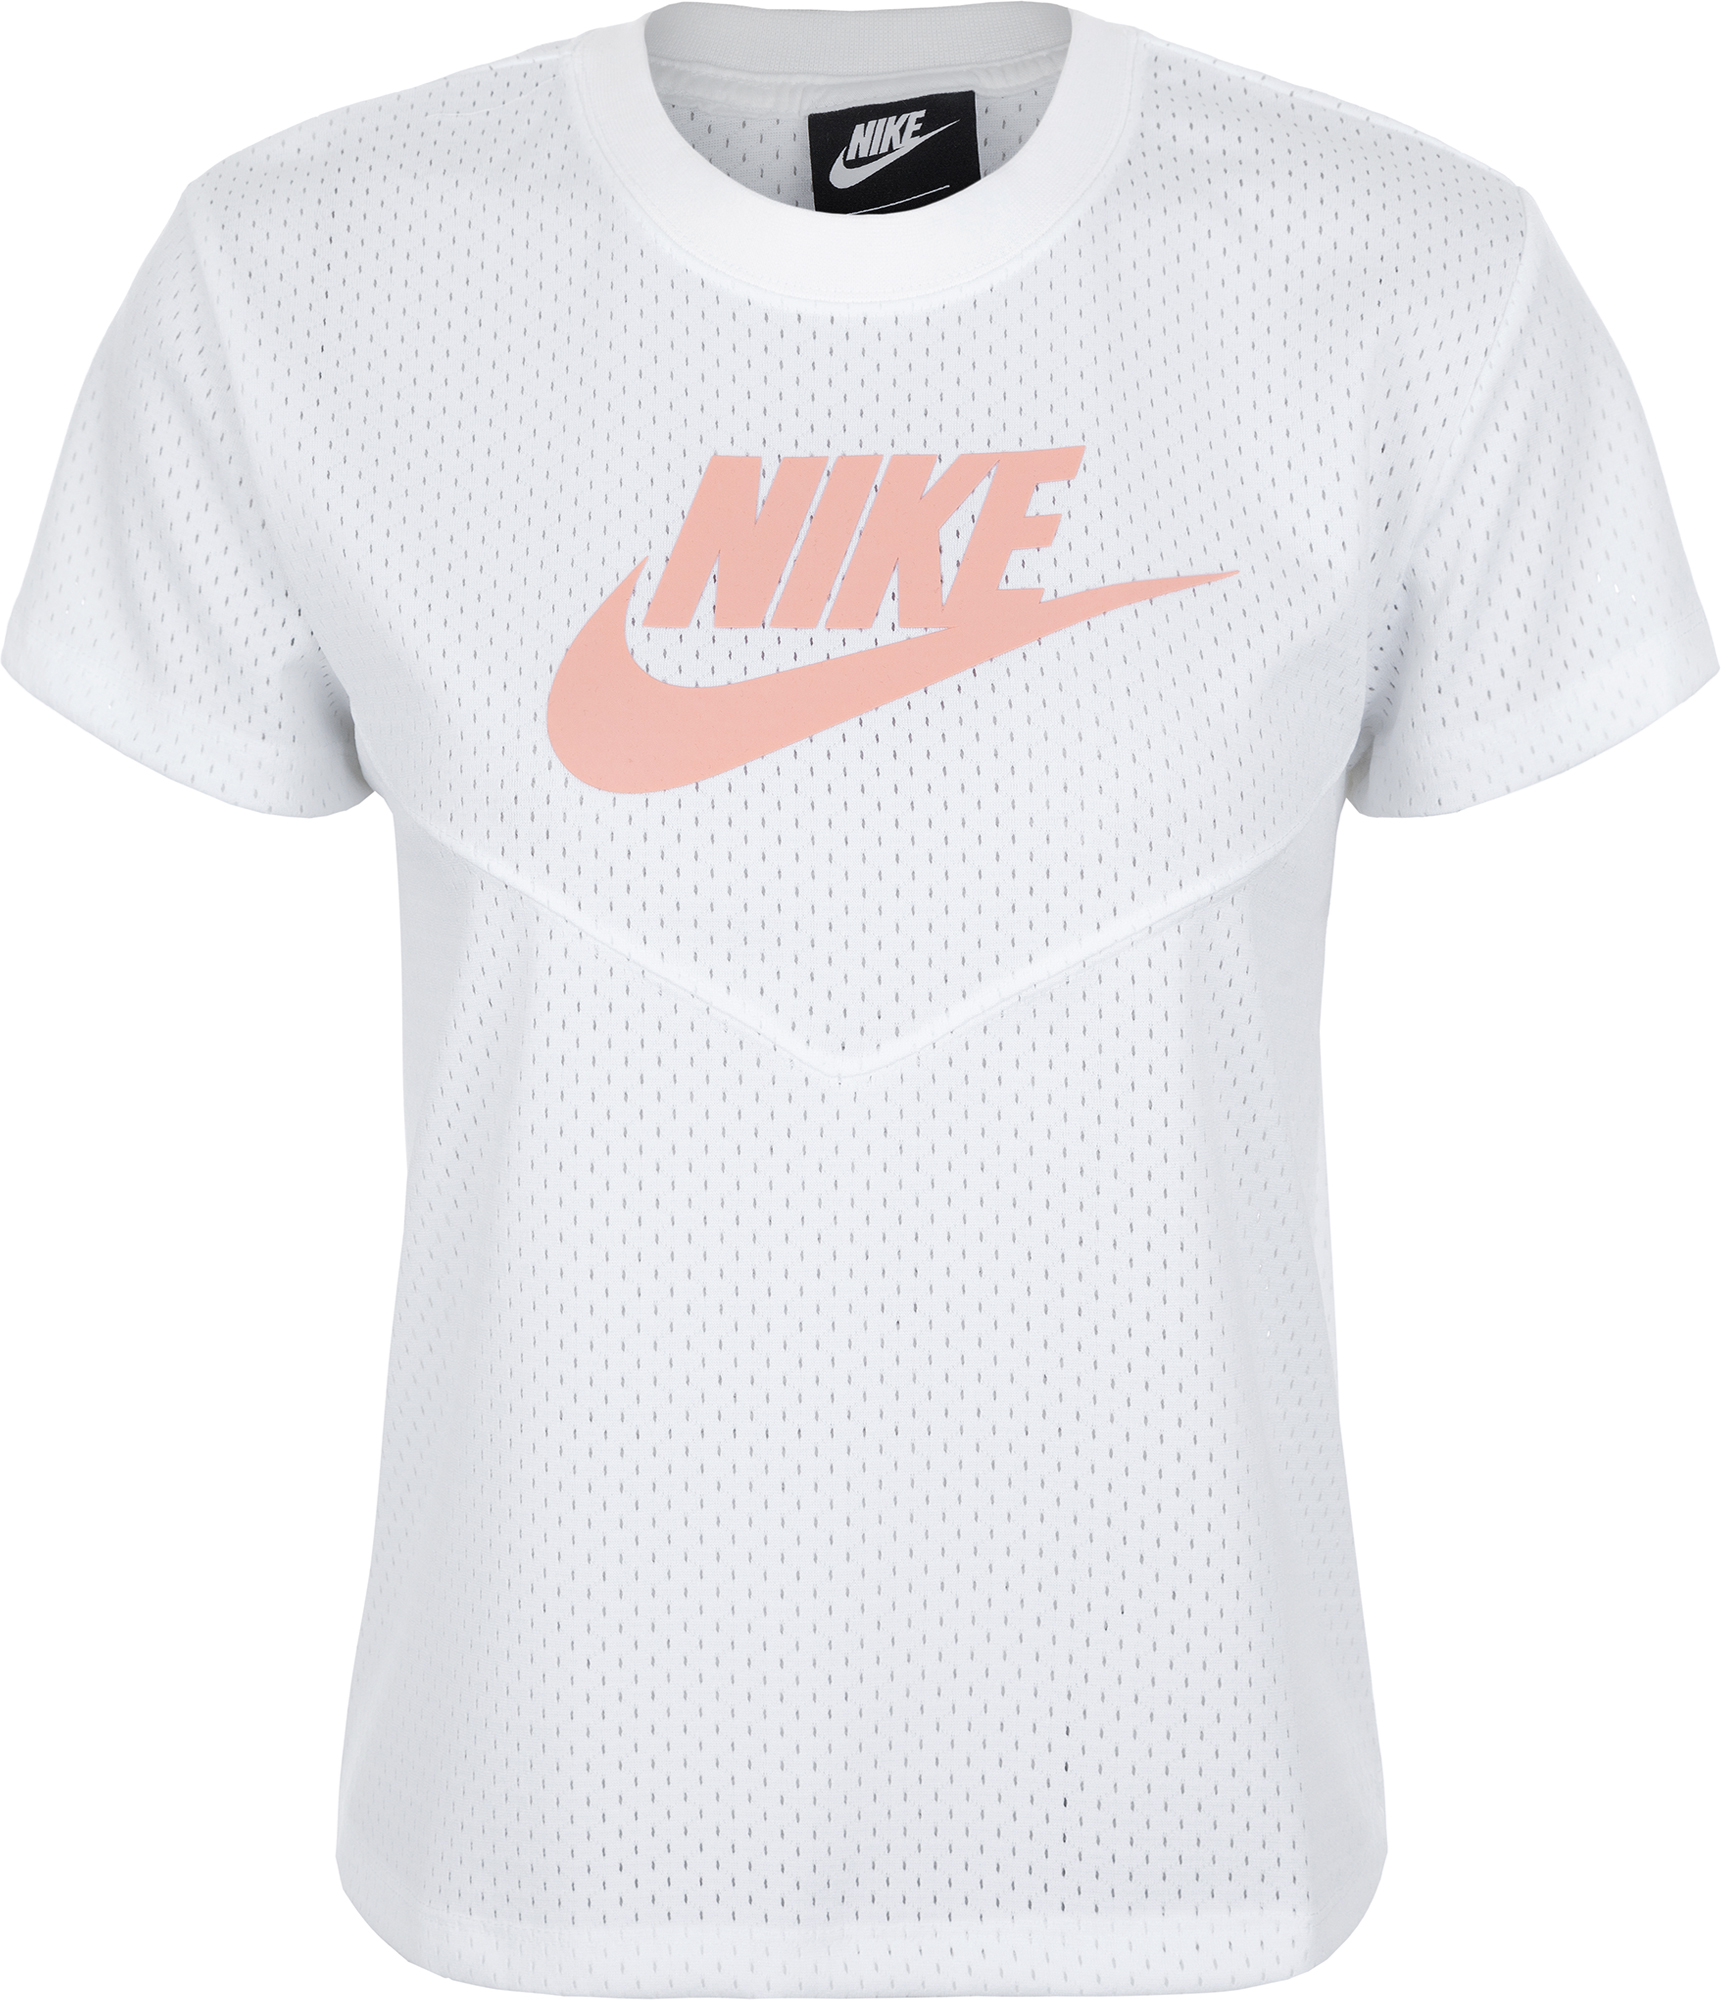 Nike Футболка женская Heritage, размер 46-48